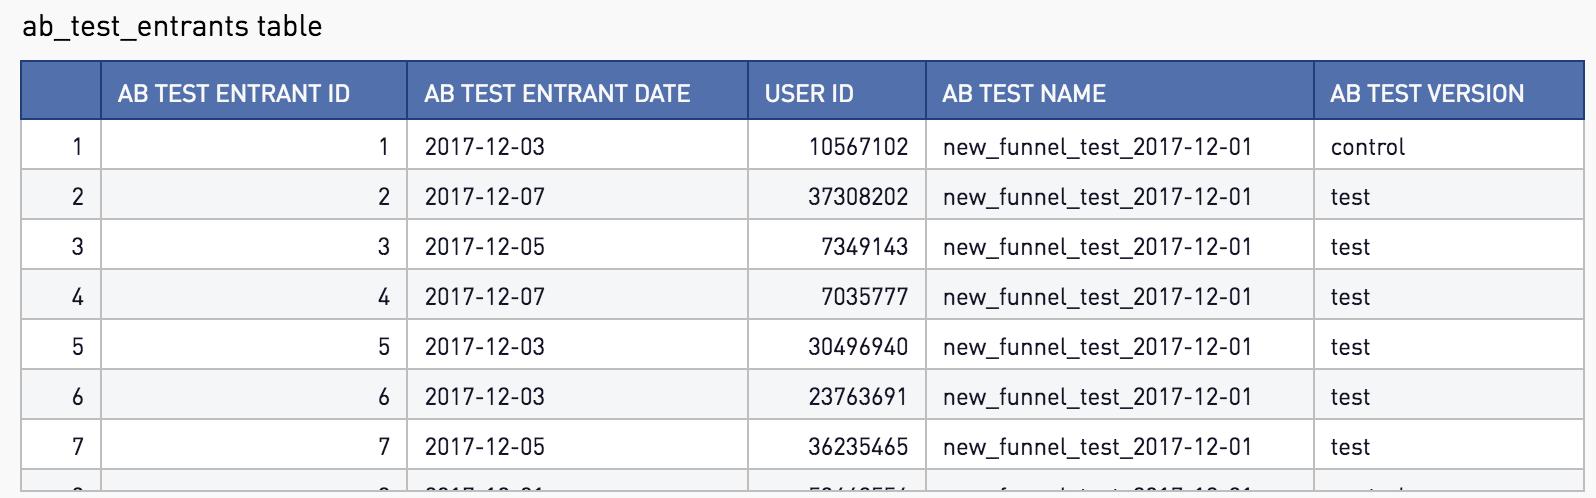 AB Test Entrants